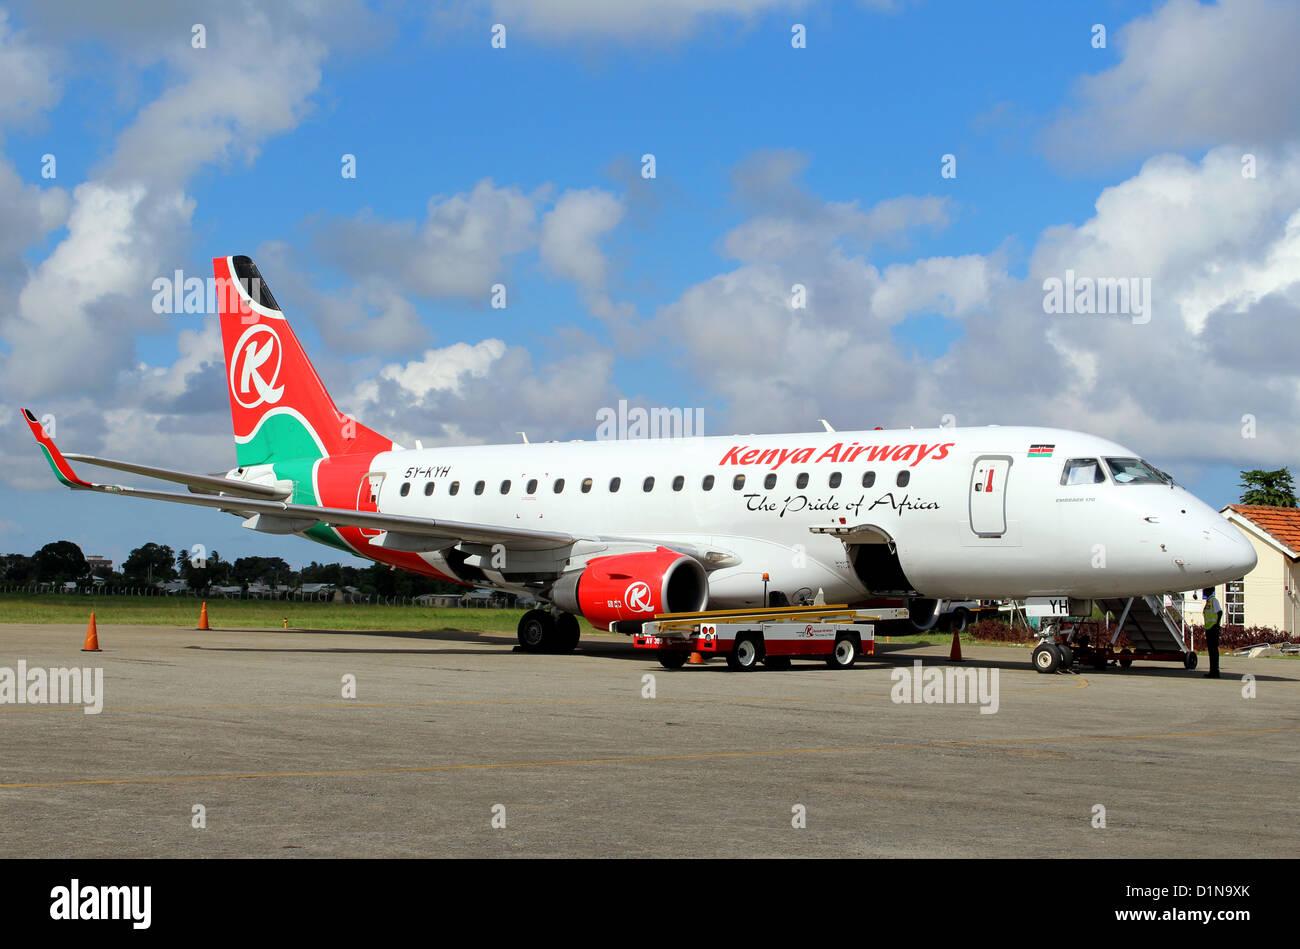 Kenya Airways plane, Malindi airport, Kenya, East Africa - Stock Image